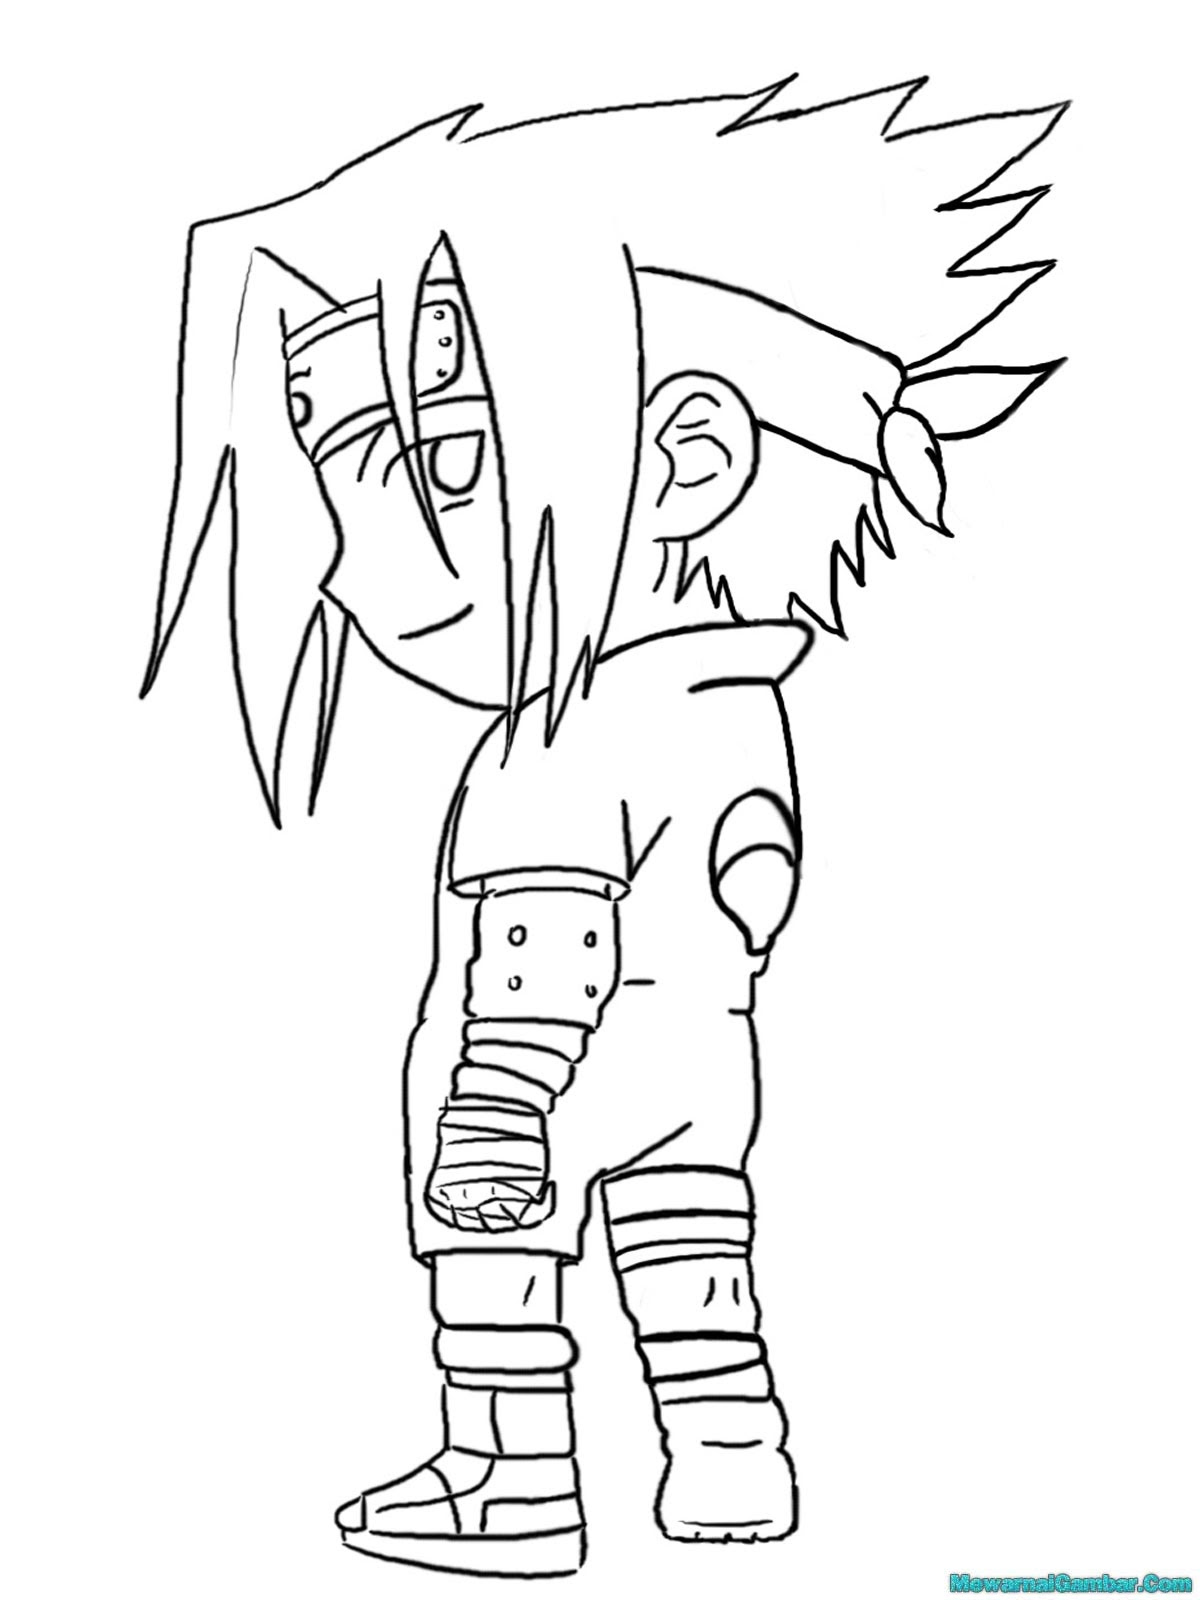 Gambar Mewarnai Tokoh Uzumaki Naruto Hitam Putih Auto Electrical